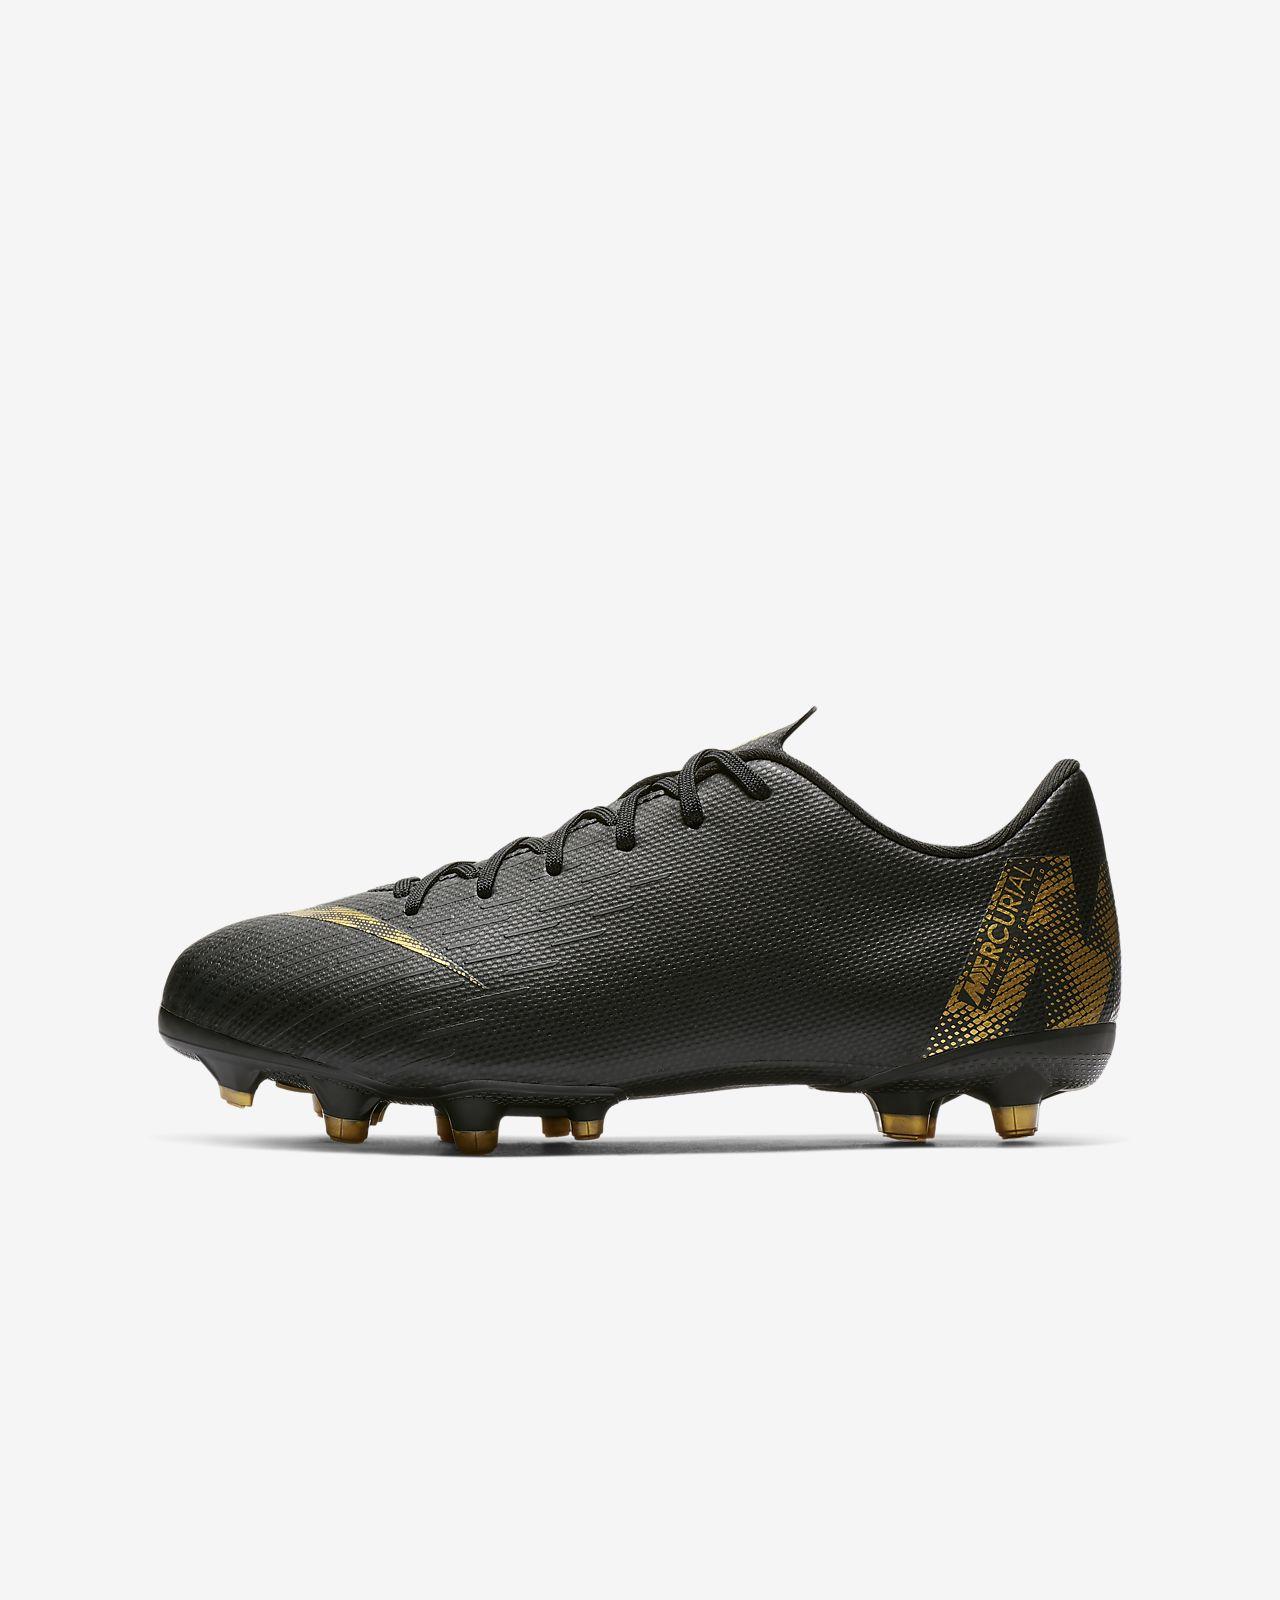 low priced ee472 dfe8f ... Chaussure de football multi-terrains à crampons Nike Jr. Mercurial  Vapor XII Academy pour